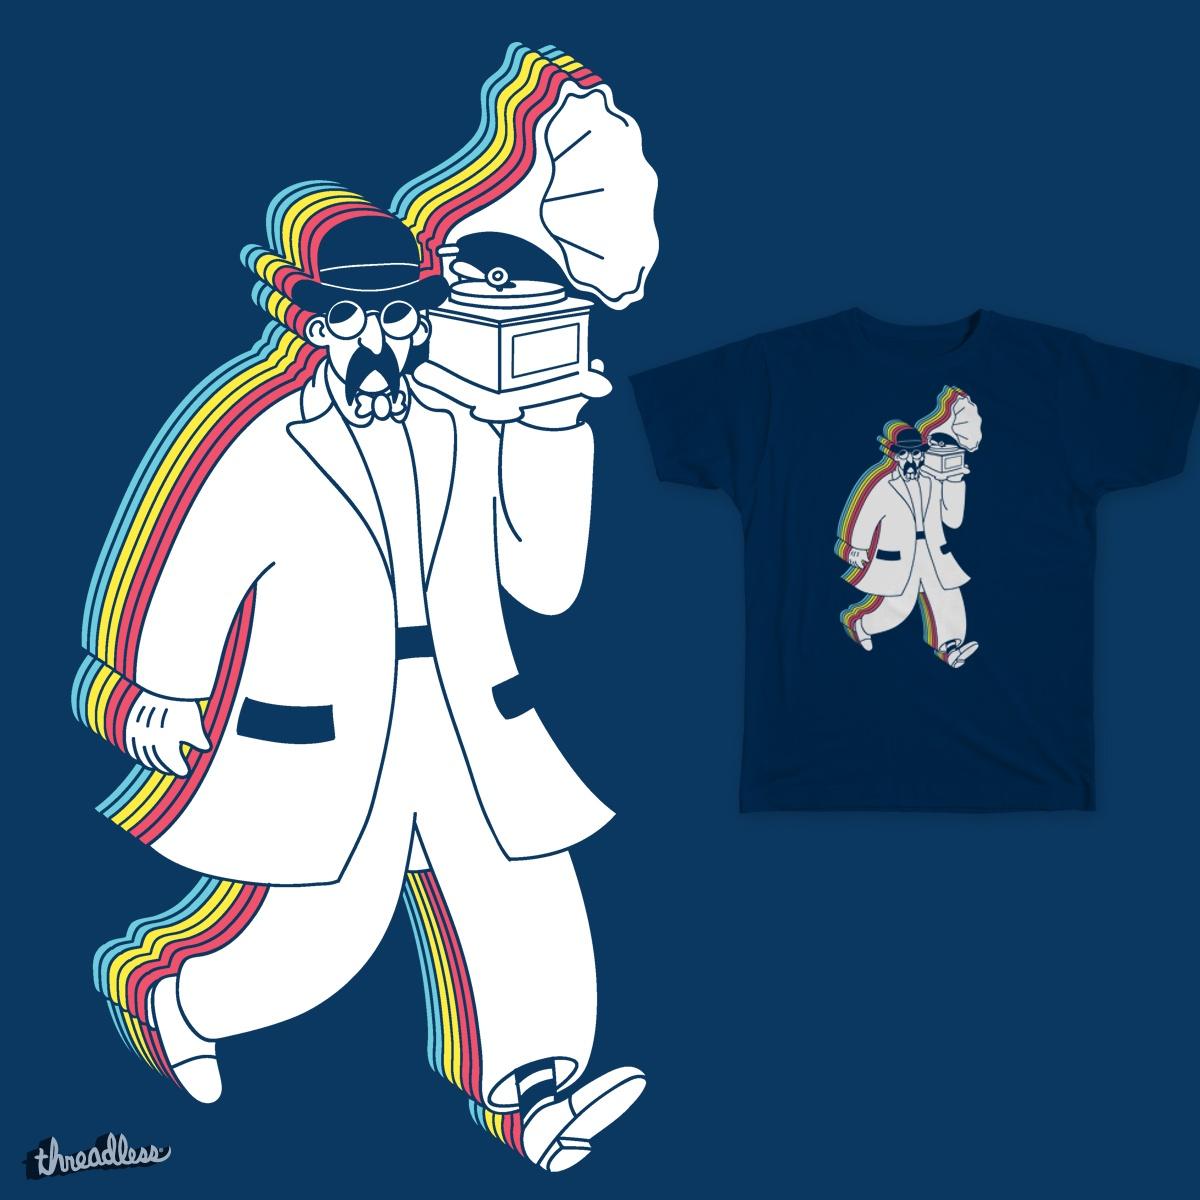 Swing-a-licious by Munaciell on Threadless